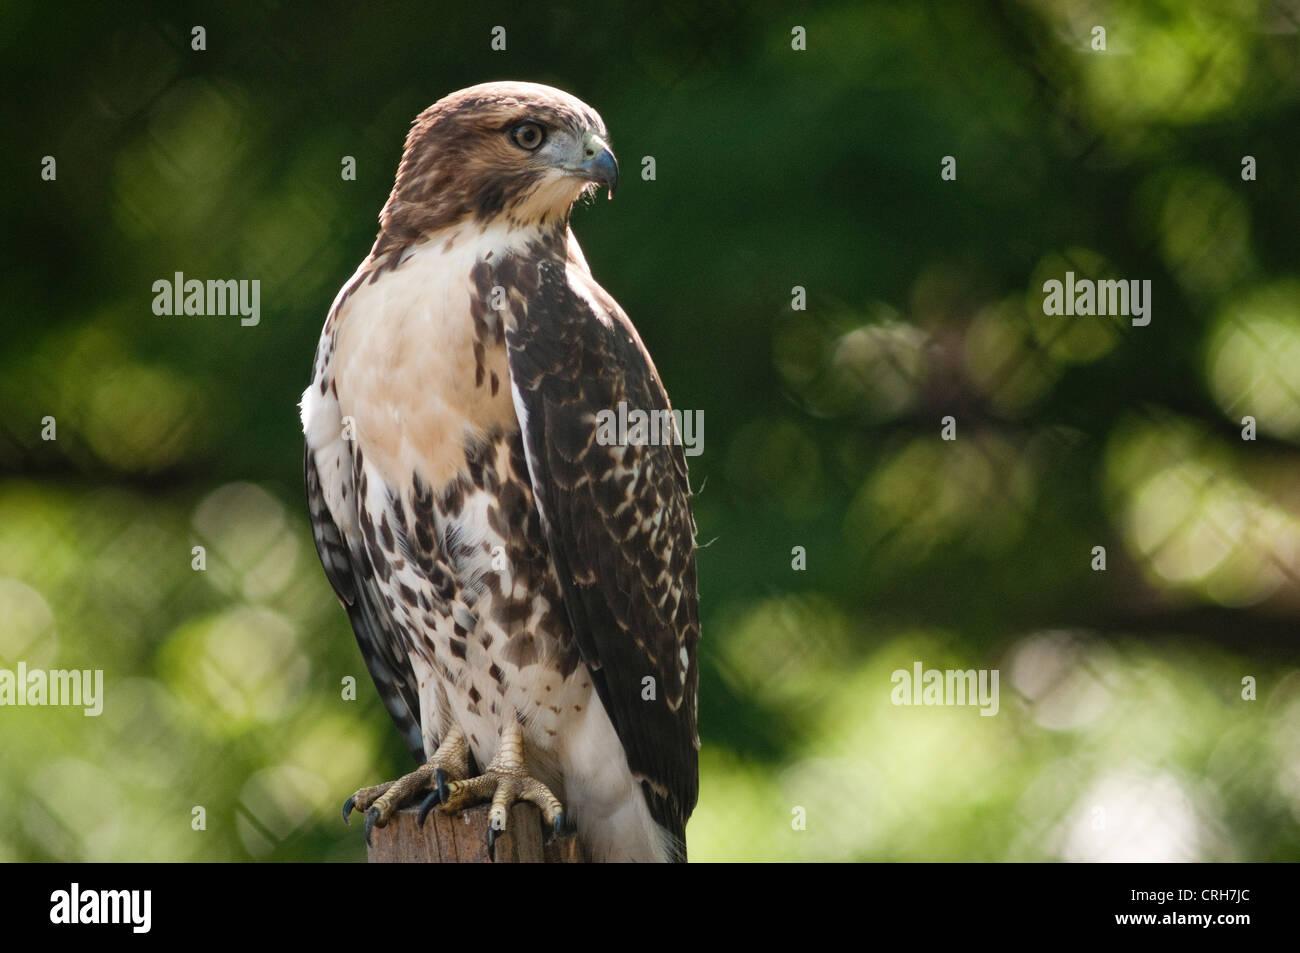 fledgling-red-tailed-hawk-in-washington-